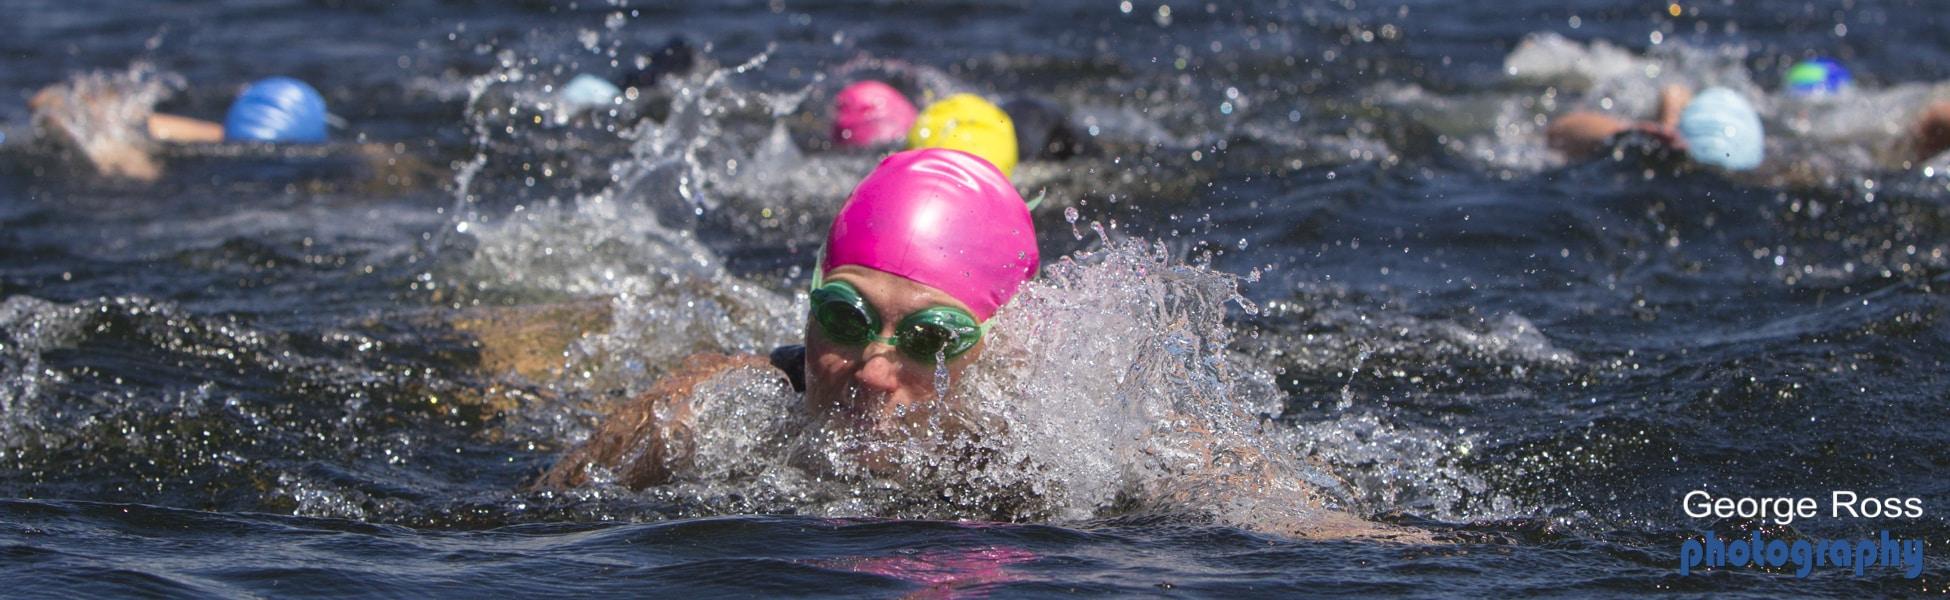 RI Triathlon Photographer